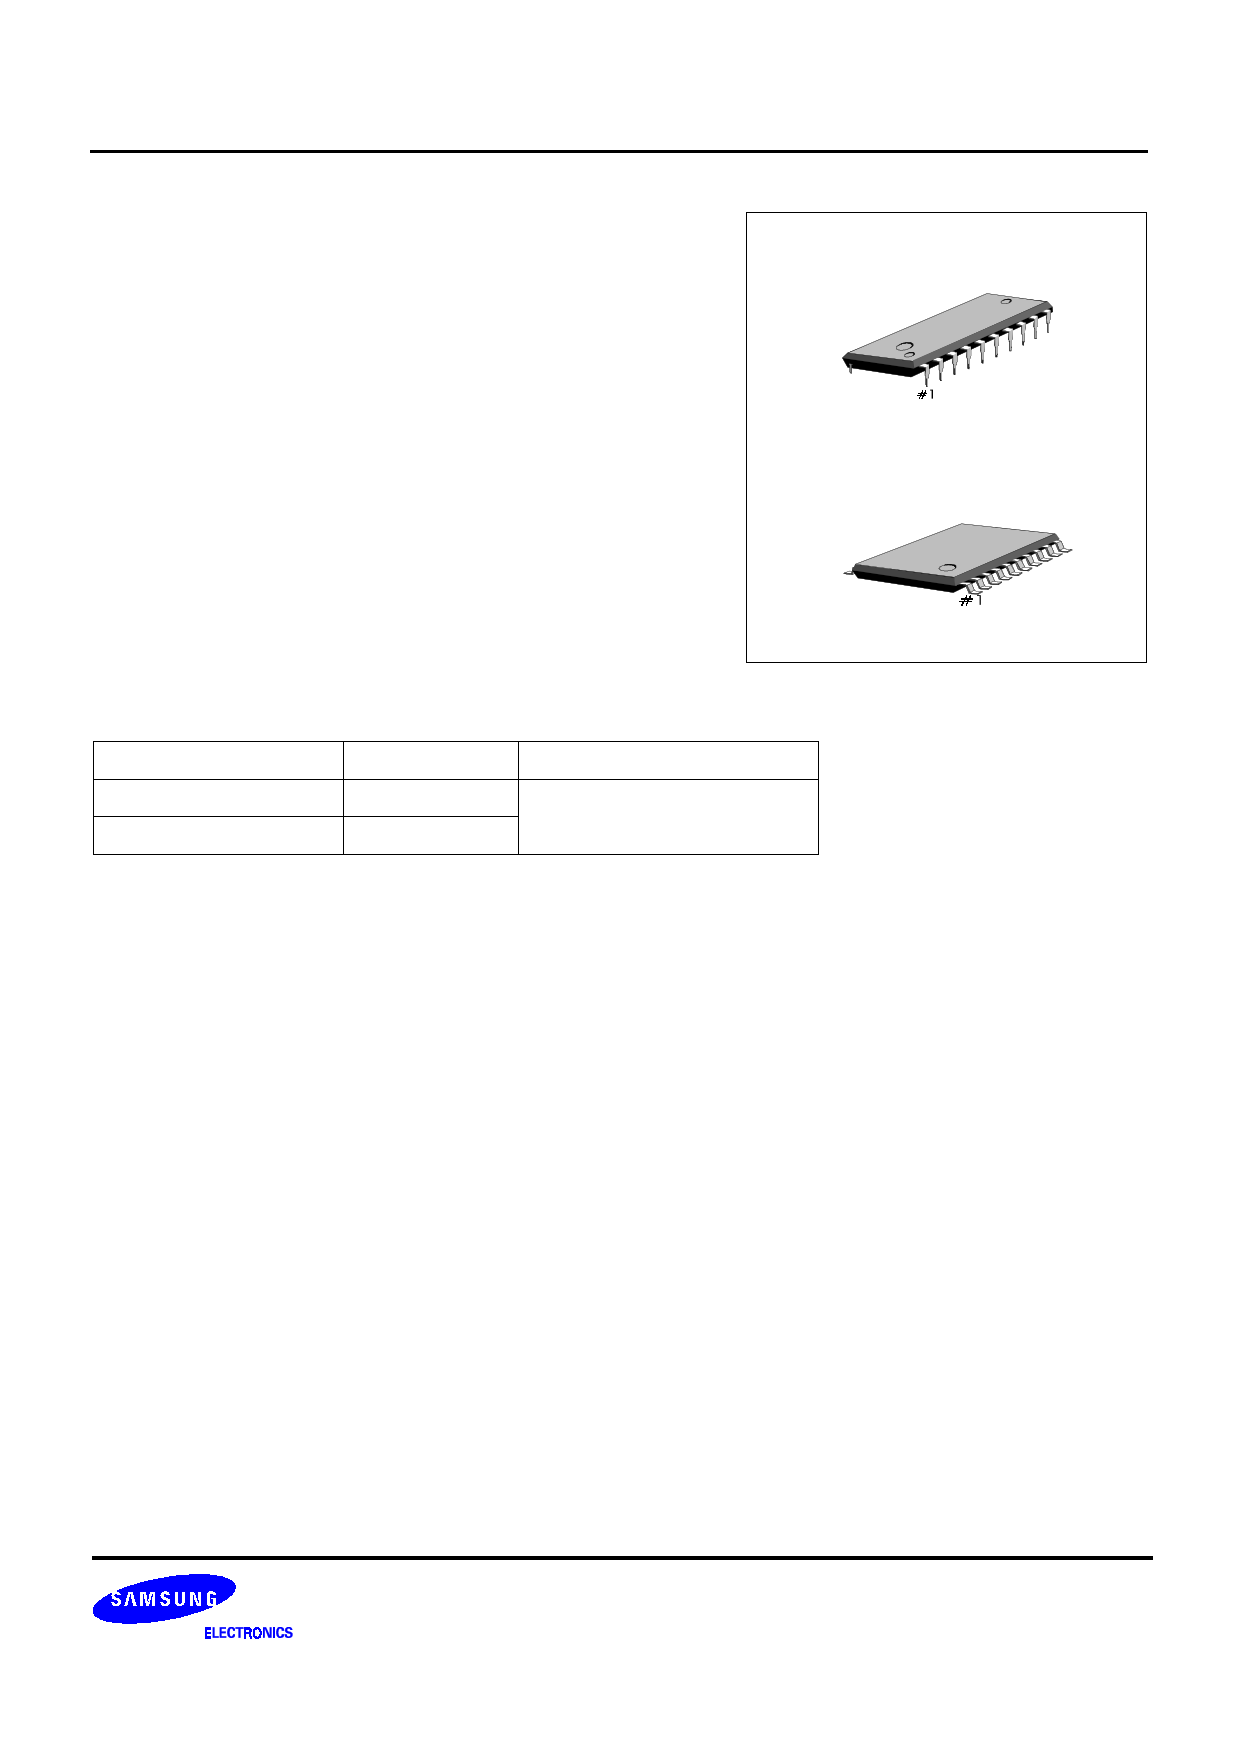 S1T8507C01-D0B0 데이터시트 및 S1T8507C01-D0B0 PDF